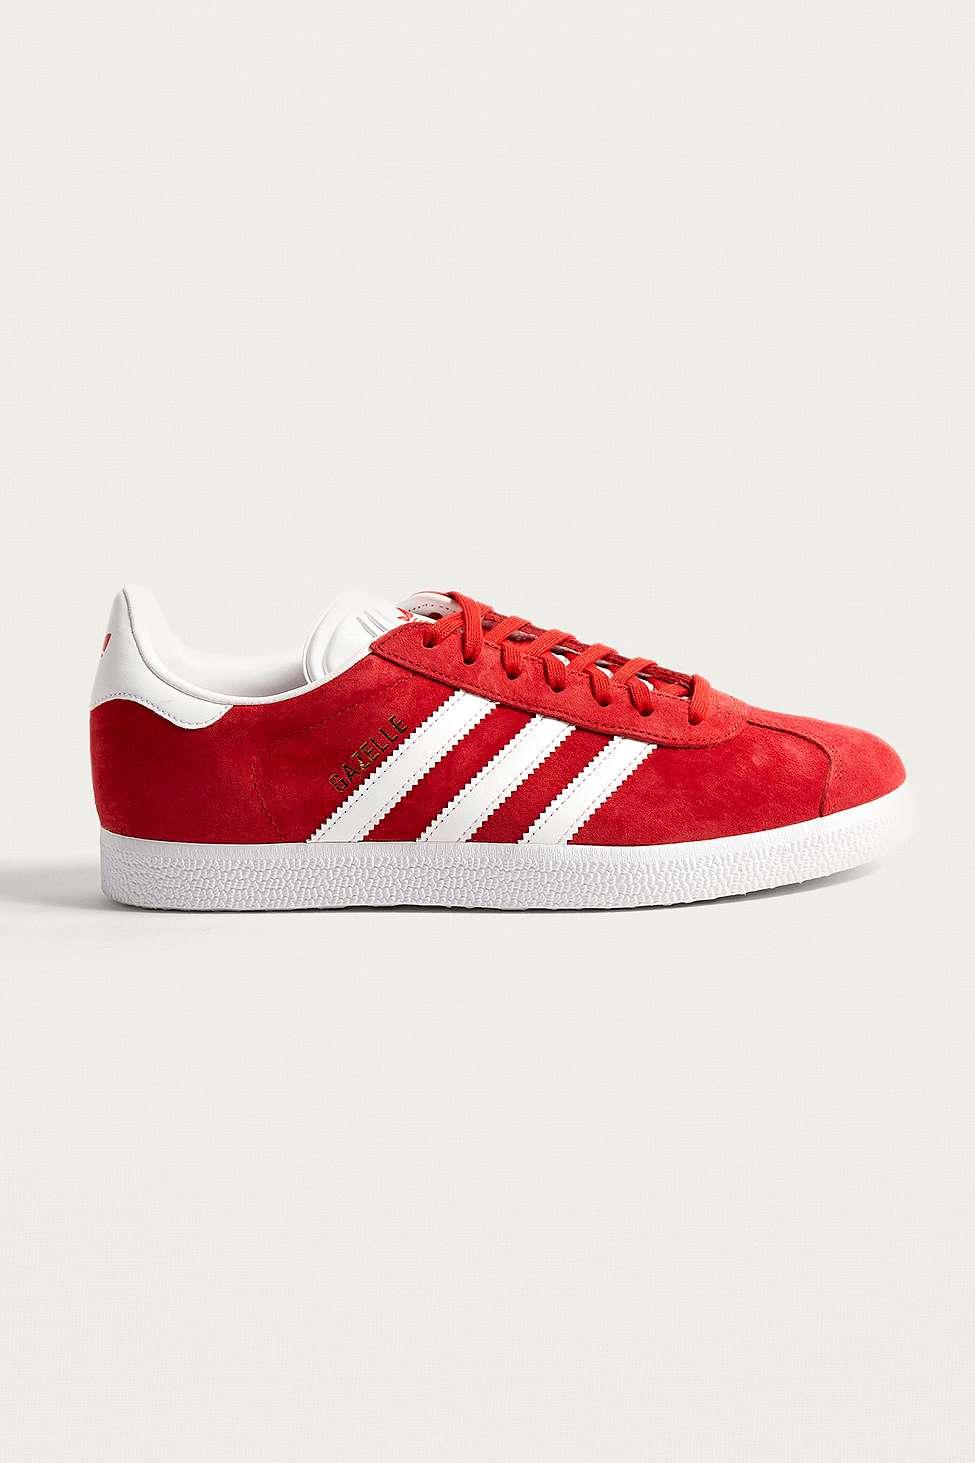 Adidas Originals Formateurs En Daim Rouge Gazelle - Rouge snInN7r